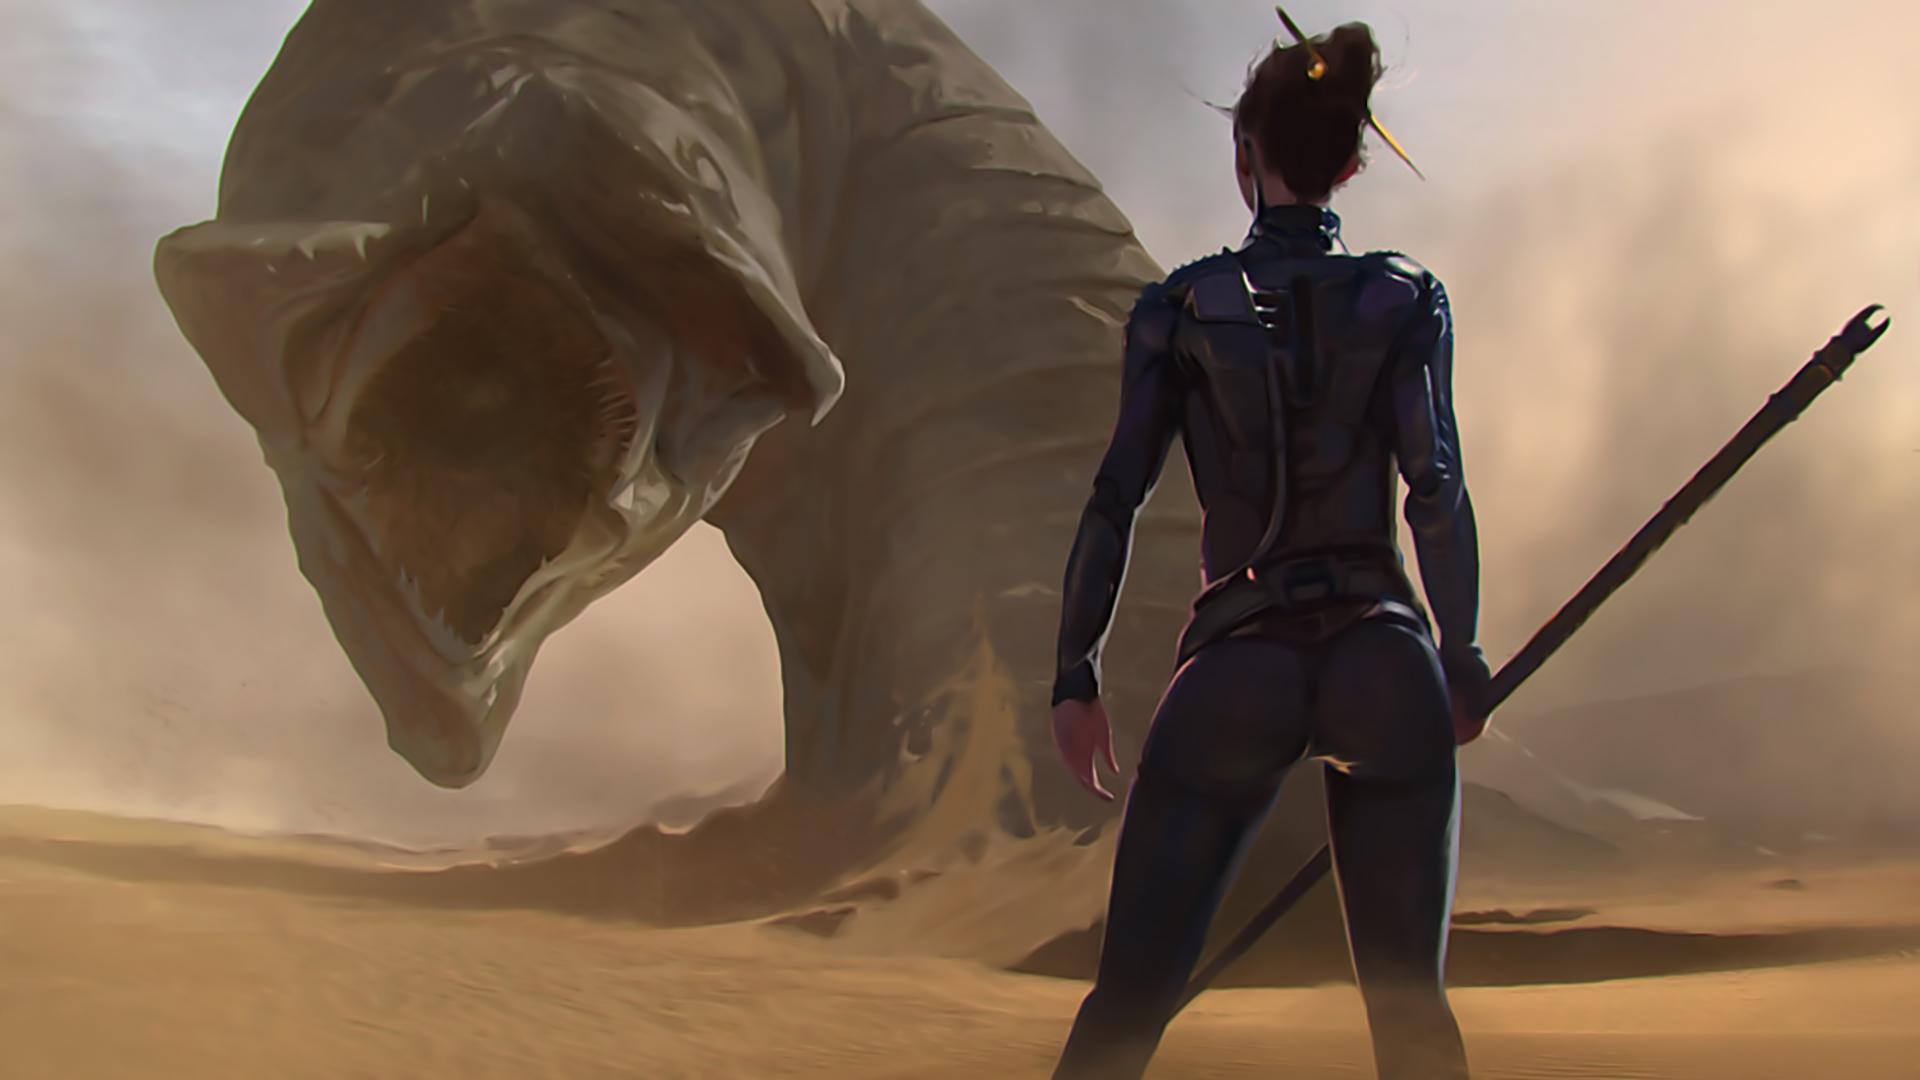 Dune HD Wallpaper